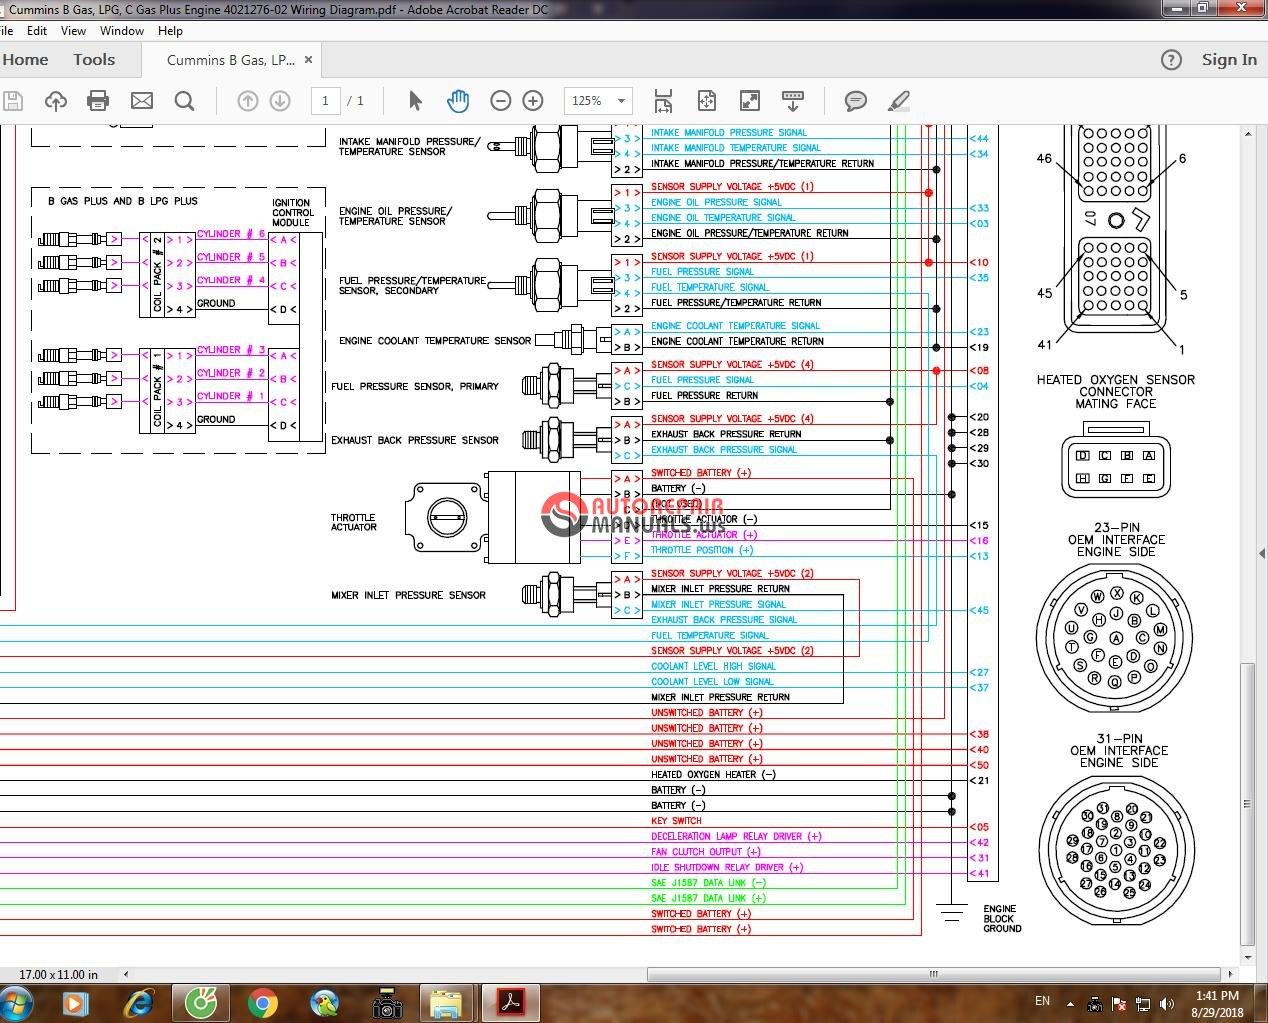 hight resolution of  cummins b gas lpg c gas plus engine 4021276 02 wiring diagram 4